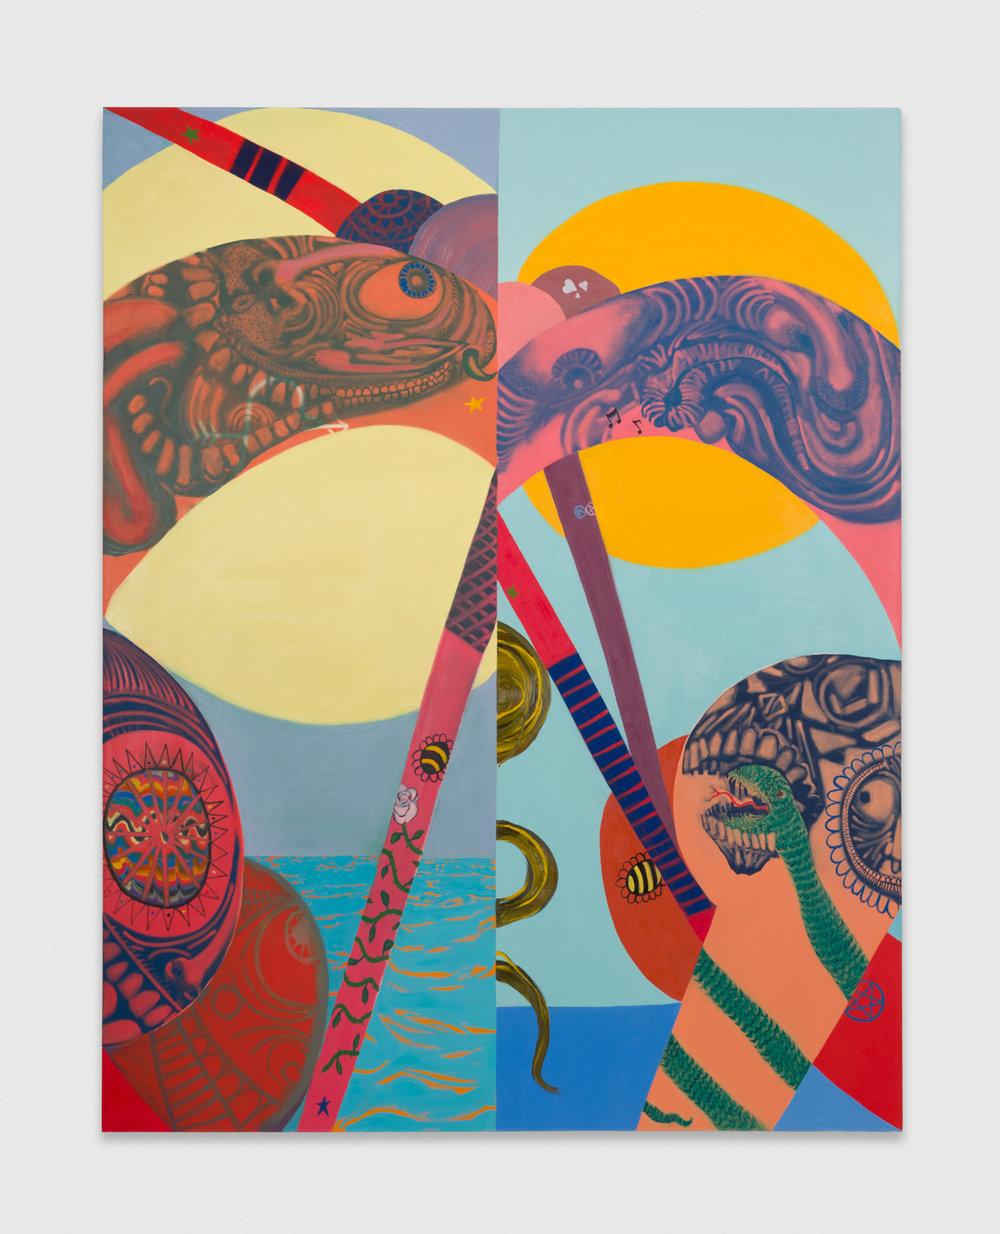 PeterFagundo  Rhymin and Stealin  2018 Oil on canvas 90h x 70w in PF005